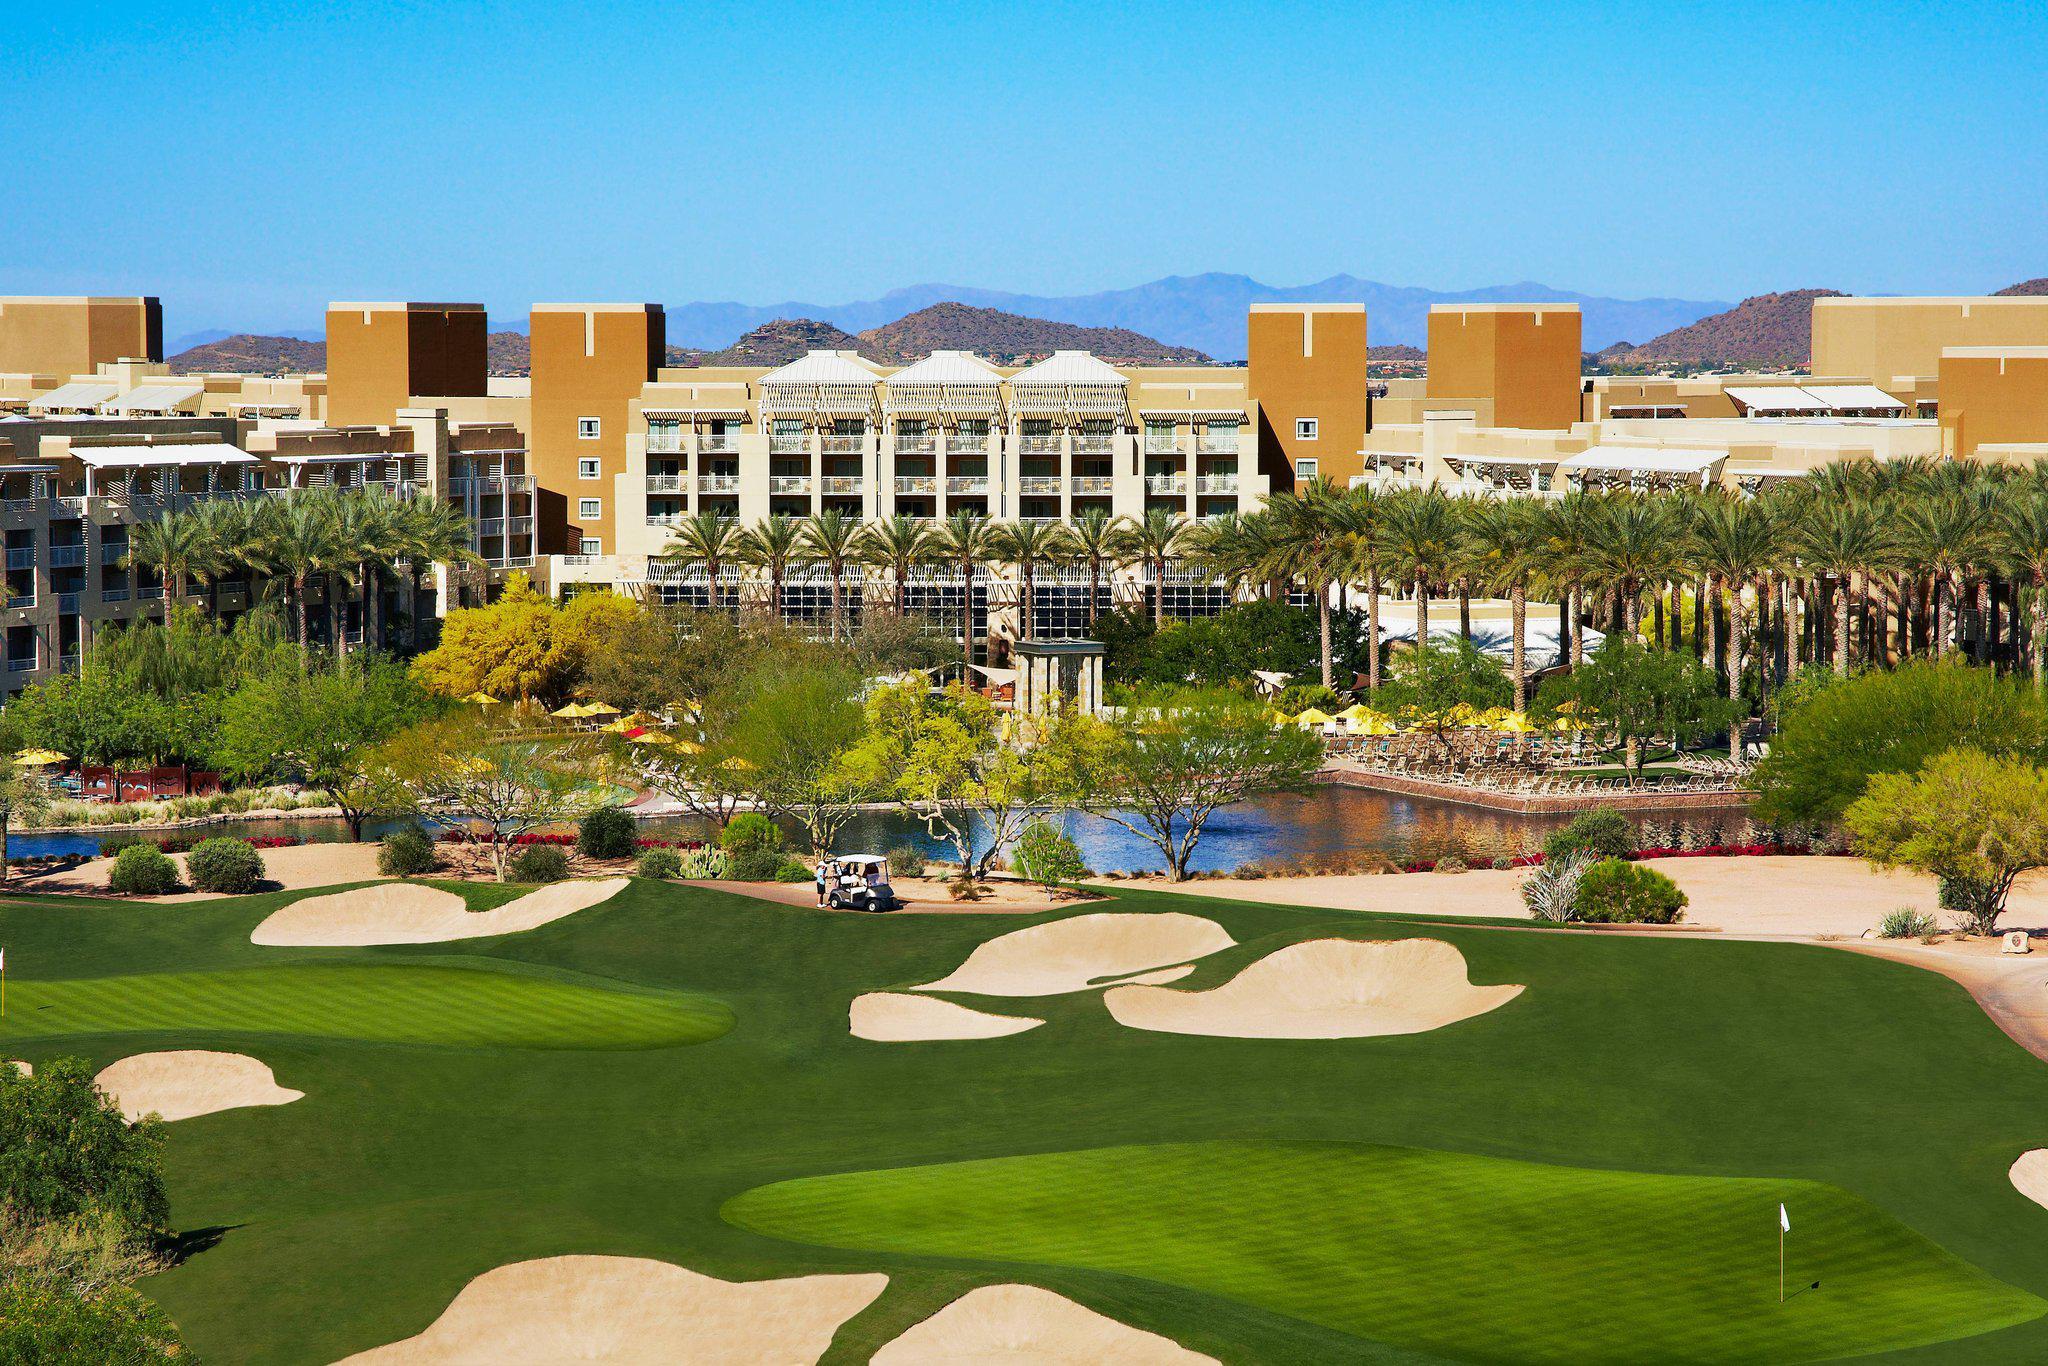 JW Marriott Phoenix Desert Ridge Resort & Spa